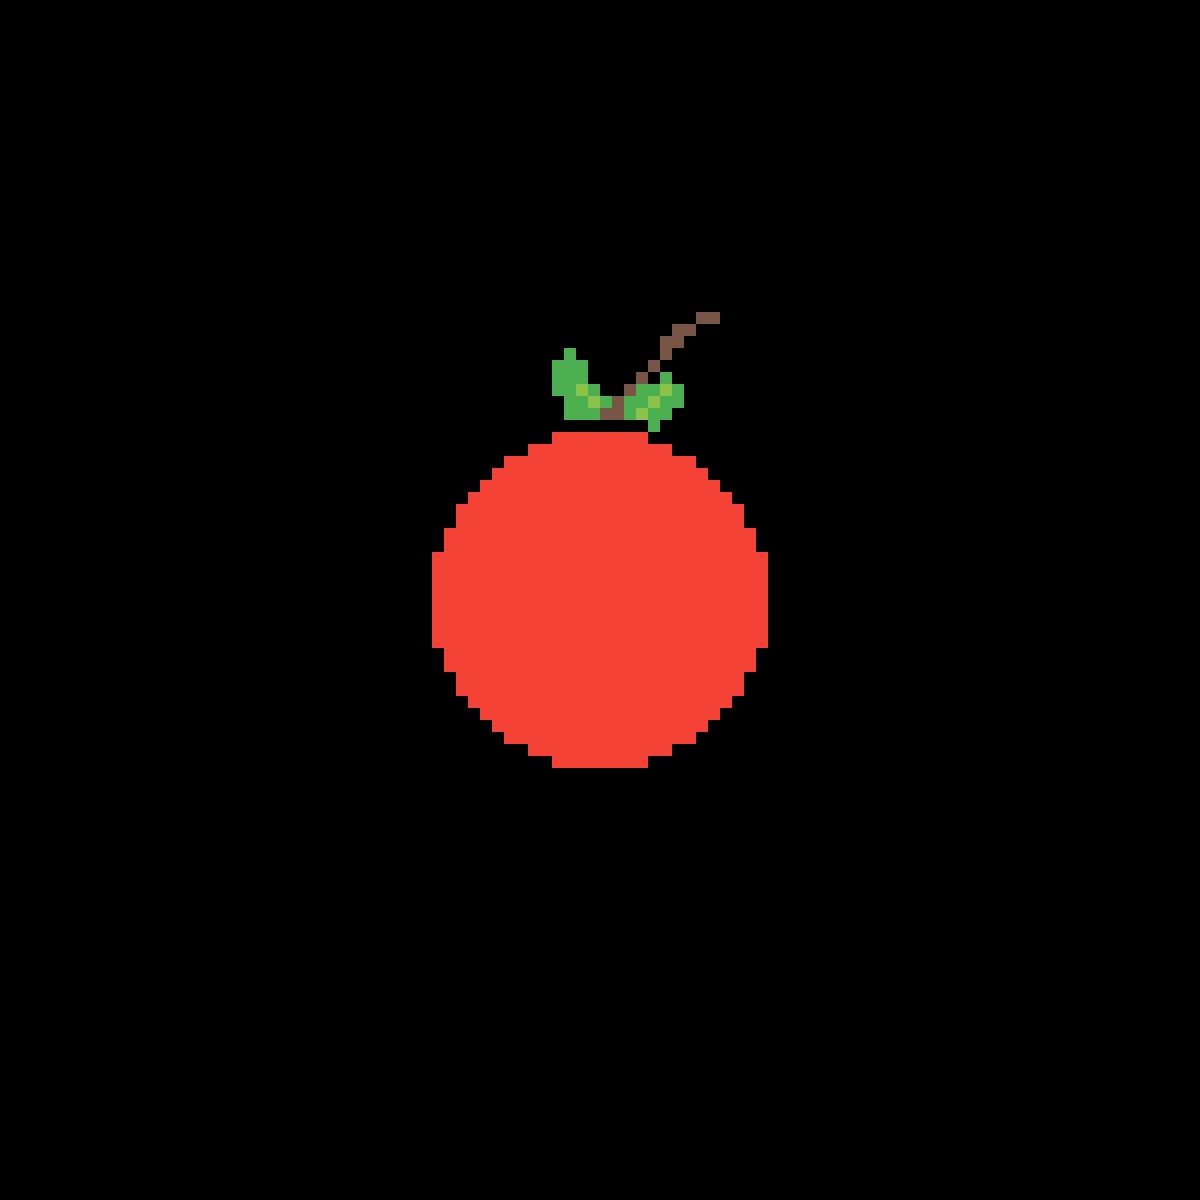 apple by beam12